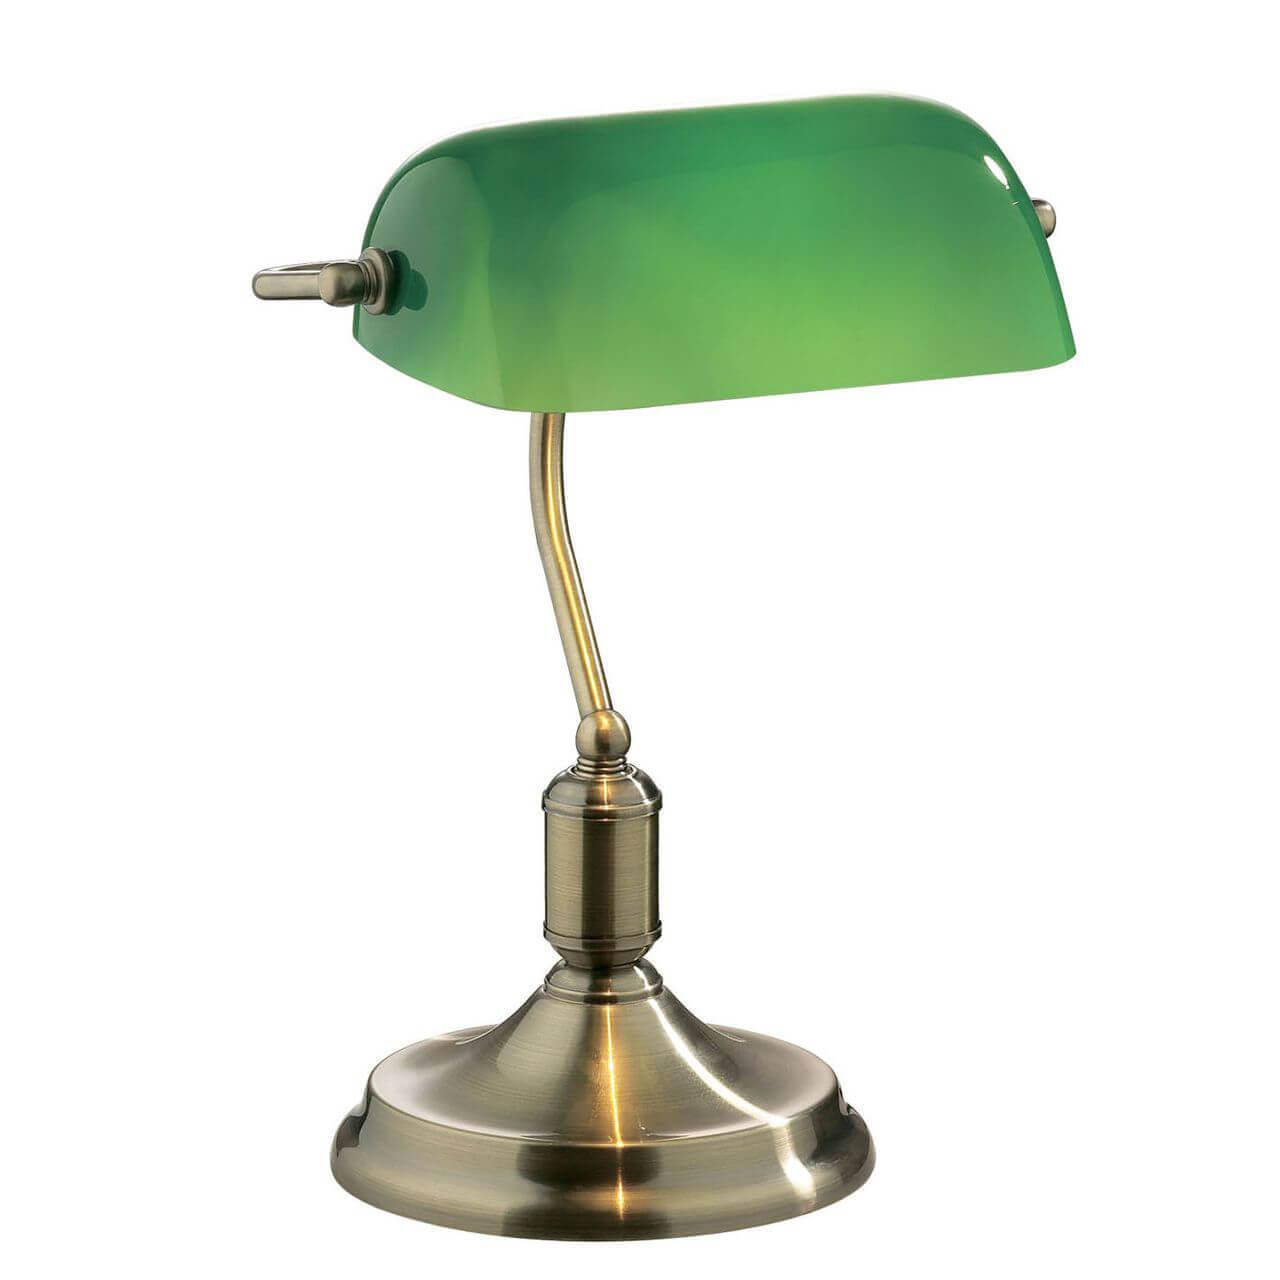 Настольная лампа Ideal Lux Lawyer TL1 Brunito недорого